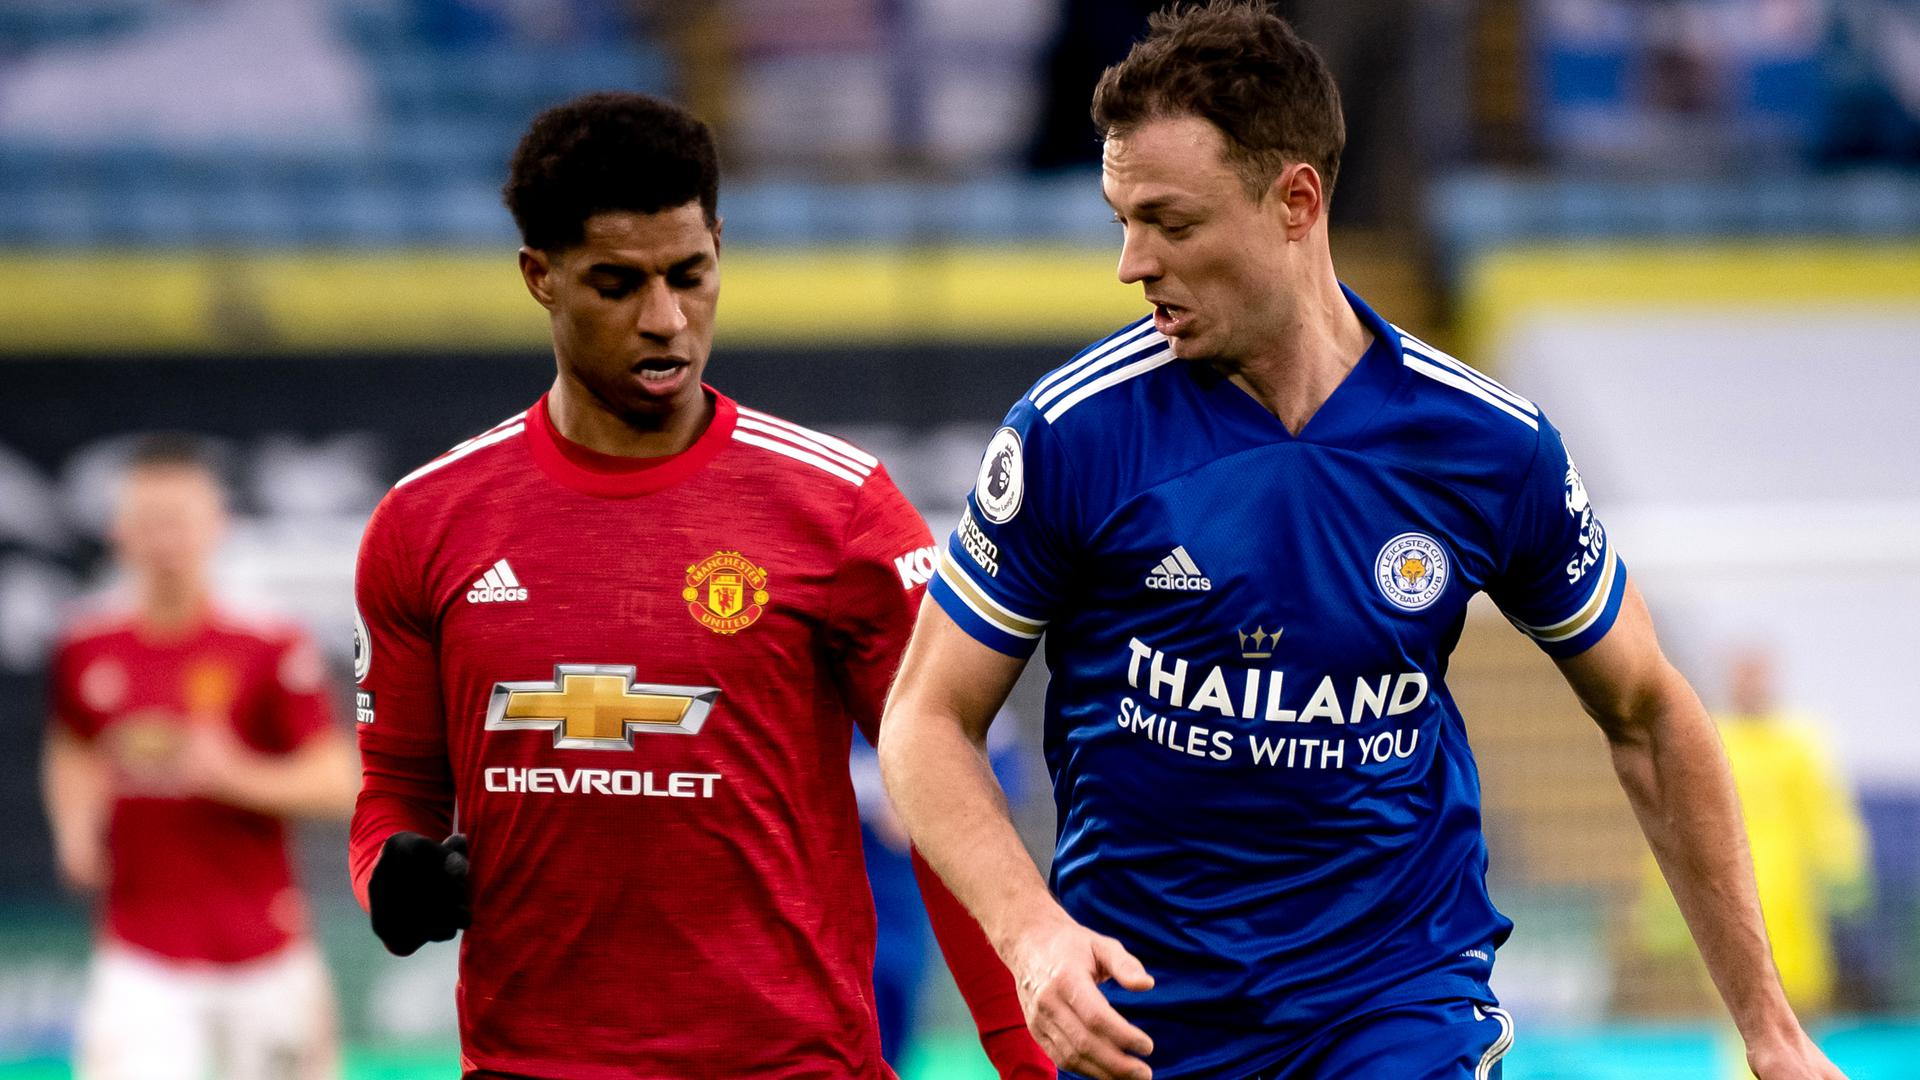 Fecha confirmada para Leicester City vs. Manchester United por FA Cup   Web oficial del Manchester United